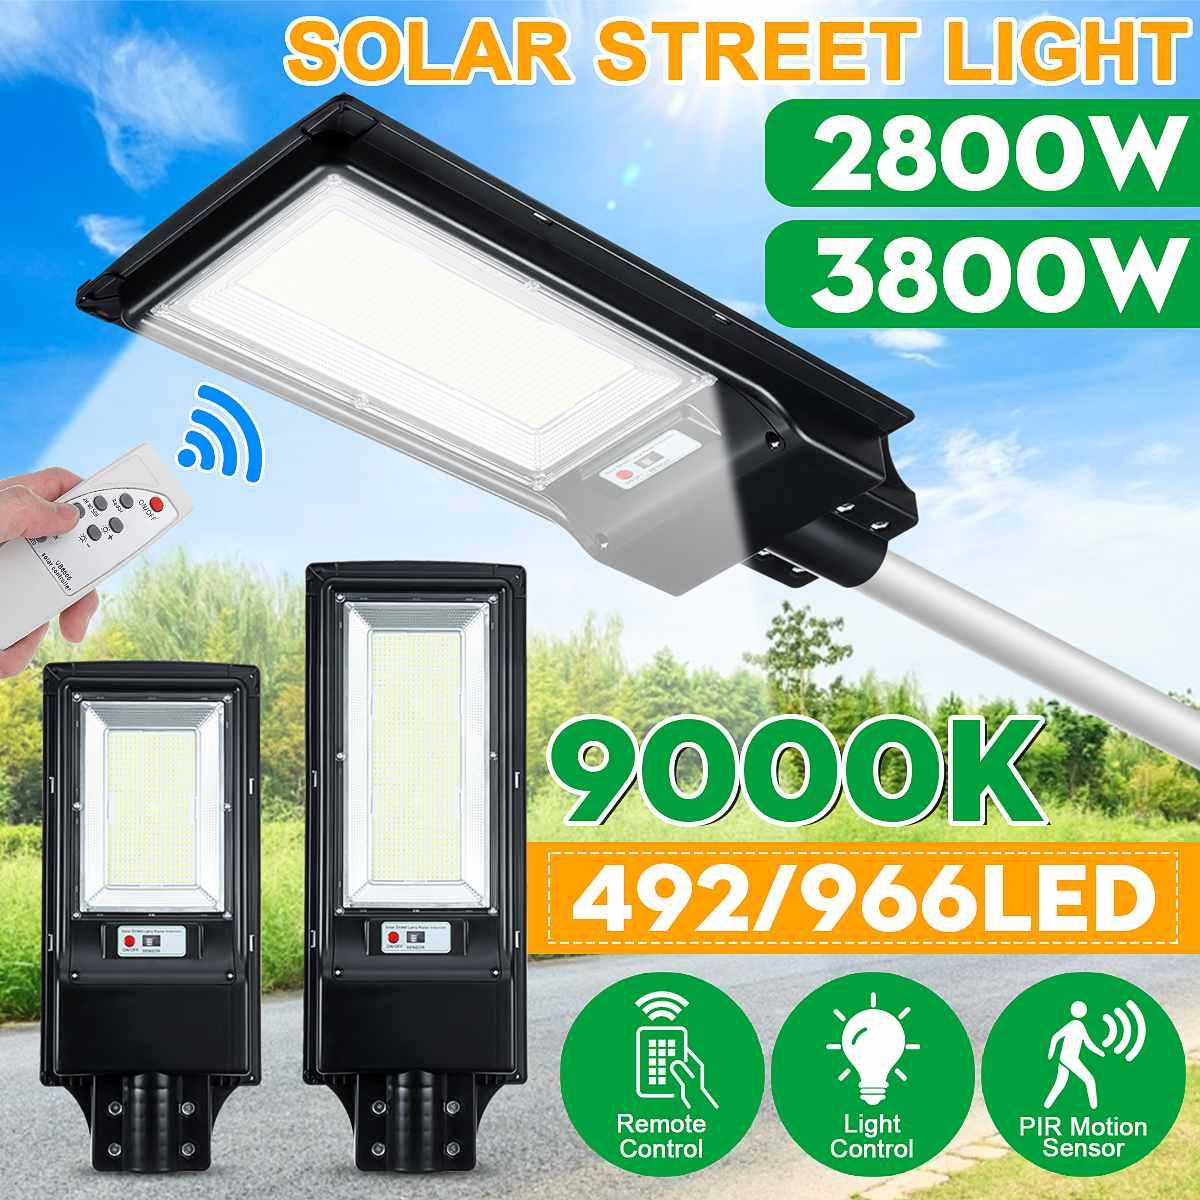 2800W 3800W LED Solar Street Light With/no Remote Control Radar Sensor Outdoor Garden Wall Lamp Industrial Security Lighting